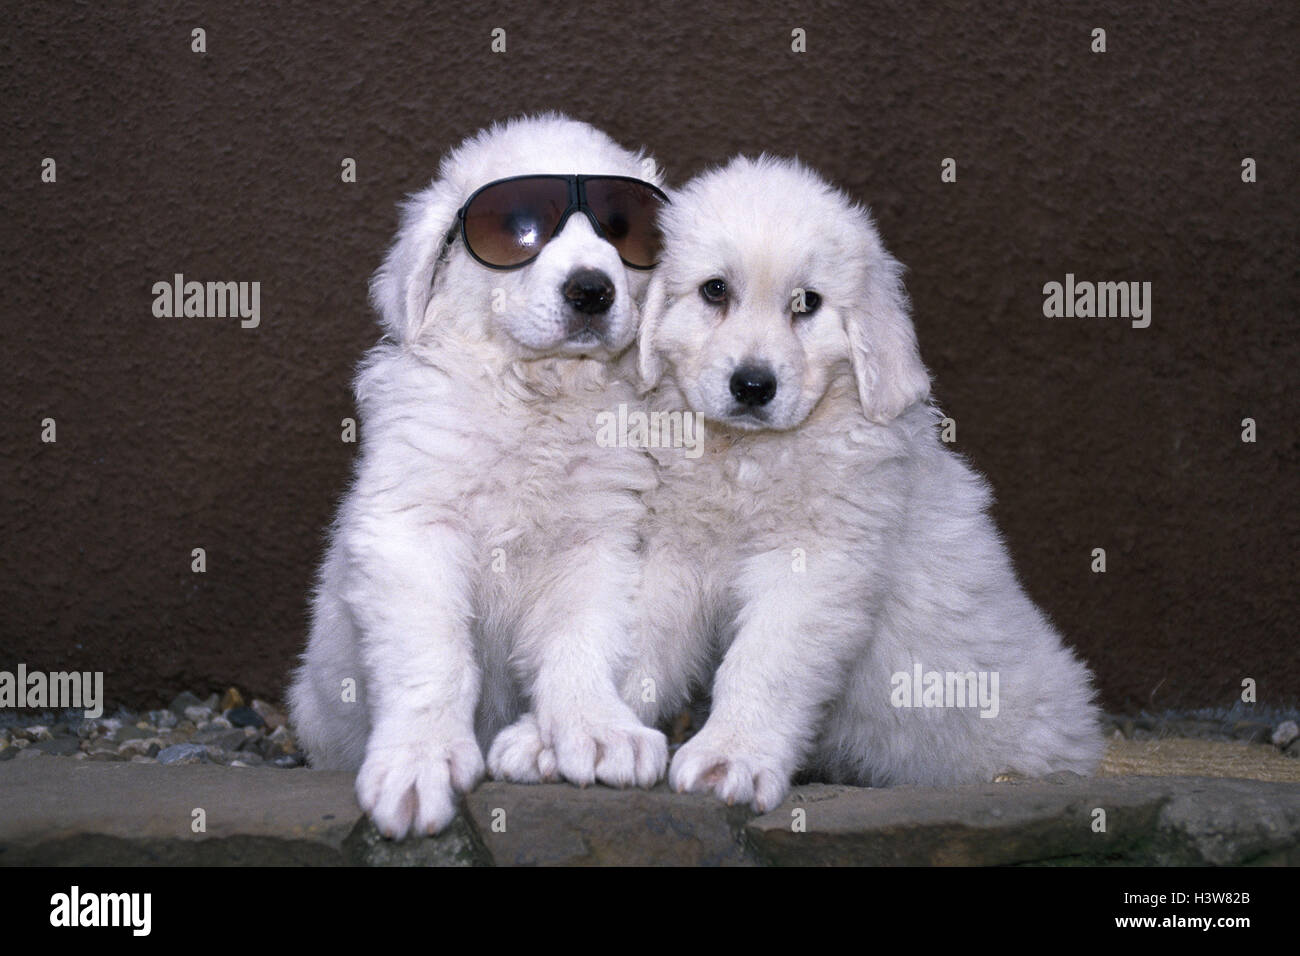 Kuvasz Puppies Hungarian Shepherds Dogs Two Sit Sunglasses